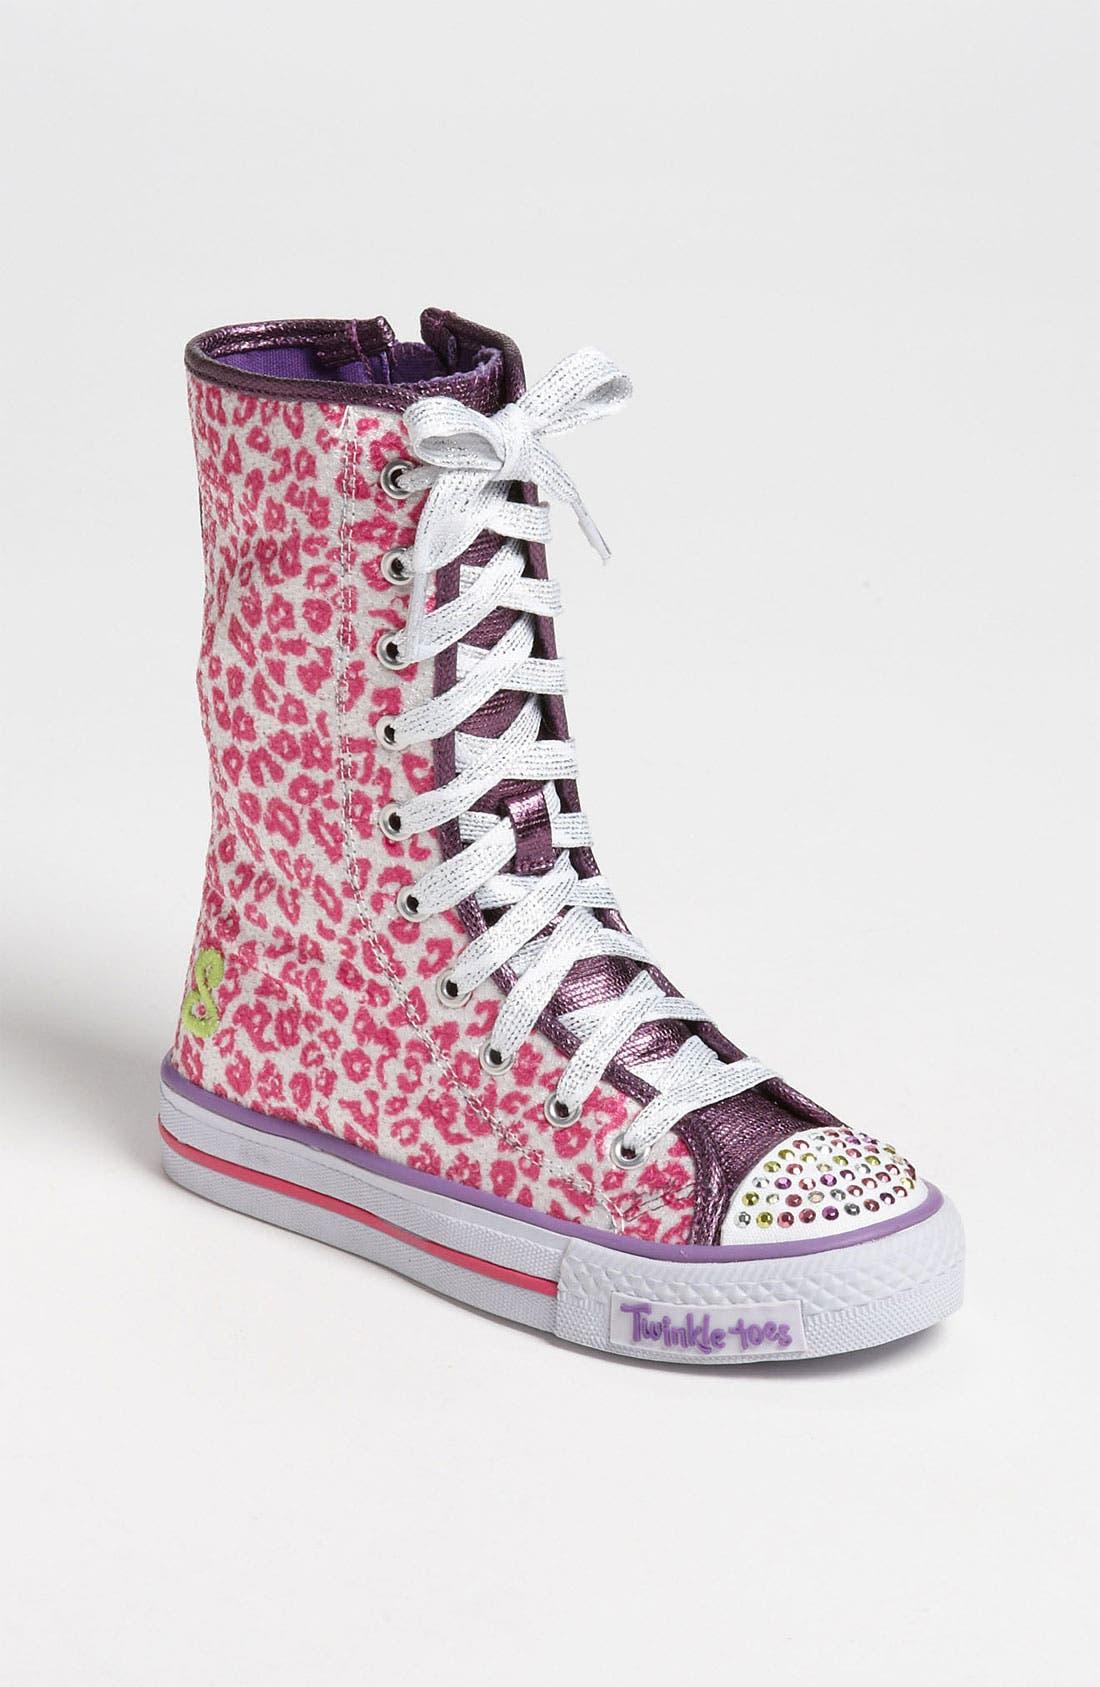 Alternate Image 1 Selected - SKECHERS 'Shuffles - Notorious' Sneaker (Toddler & Little Kid)